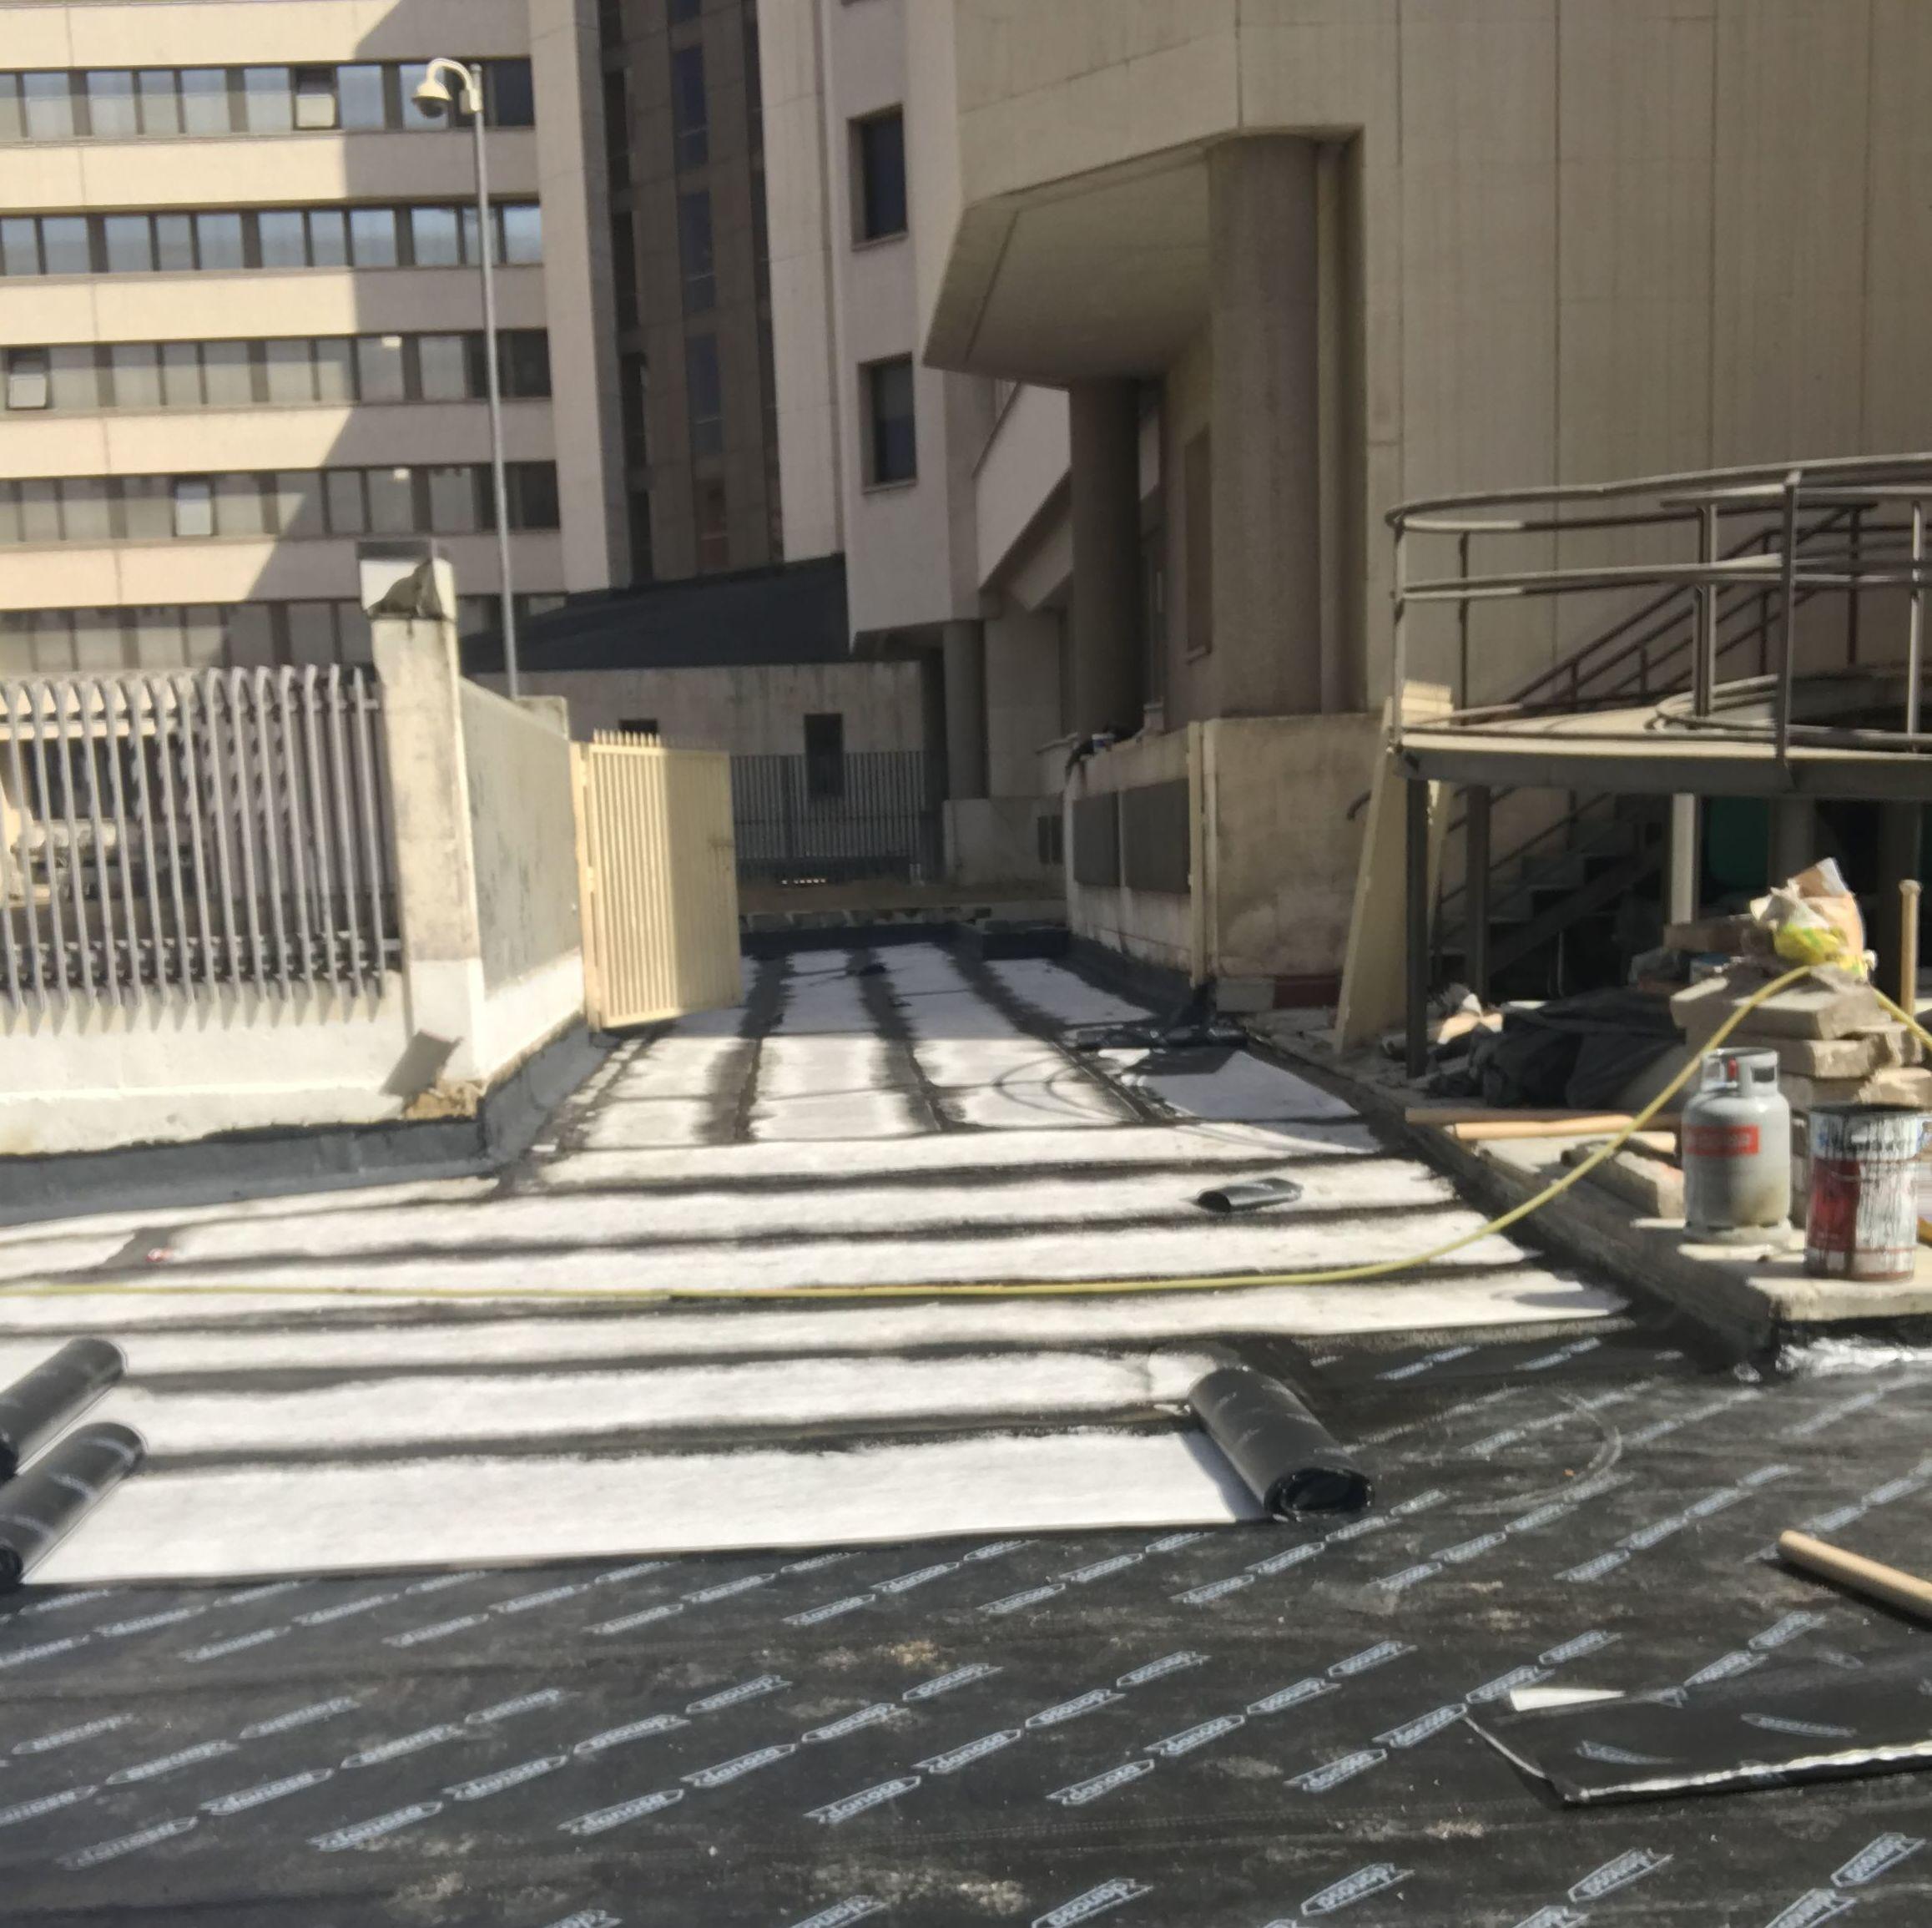 Impermeabilización bituminosa con doble lámina. Juzgados de Plaza de Castilla (Madrid)